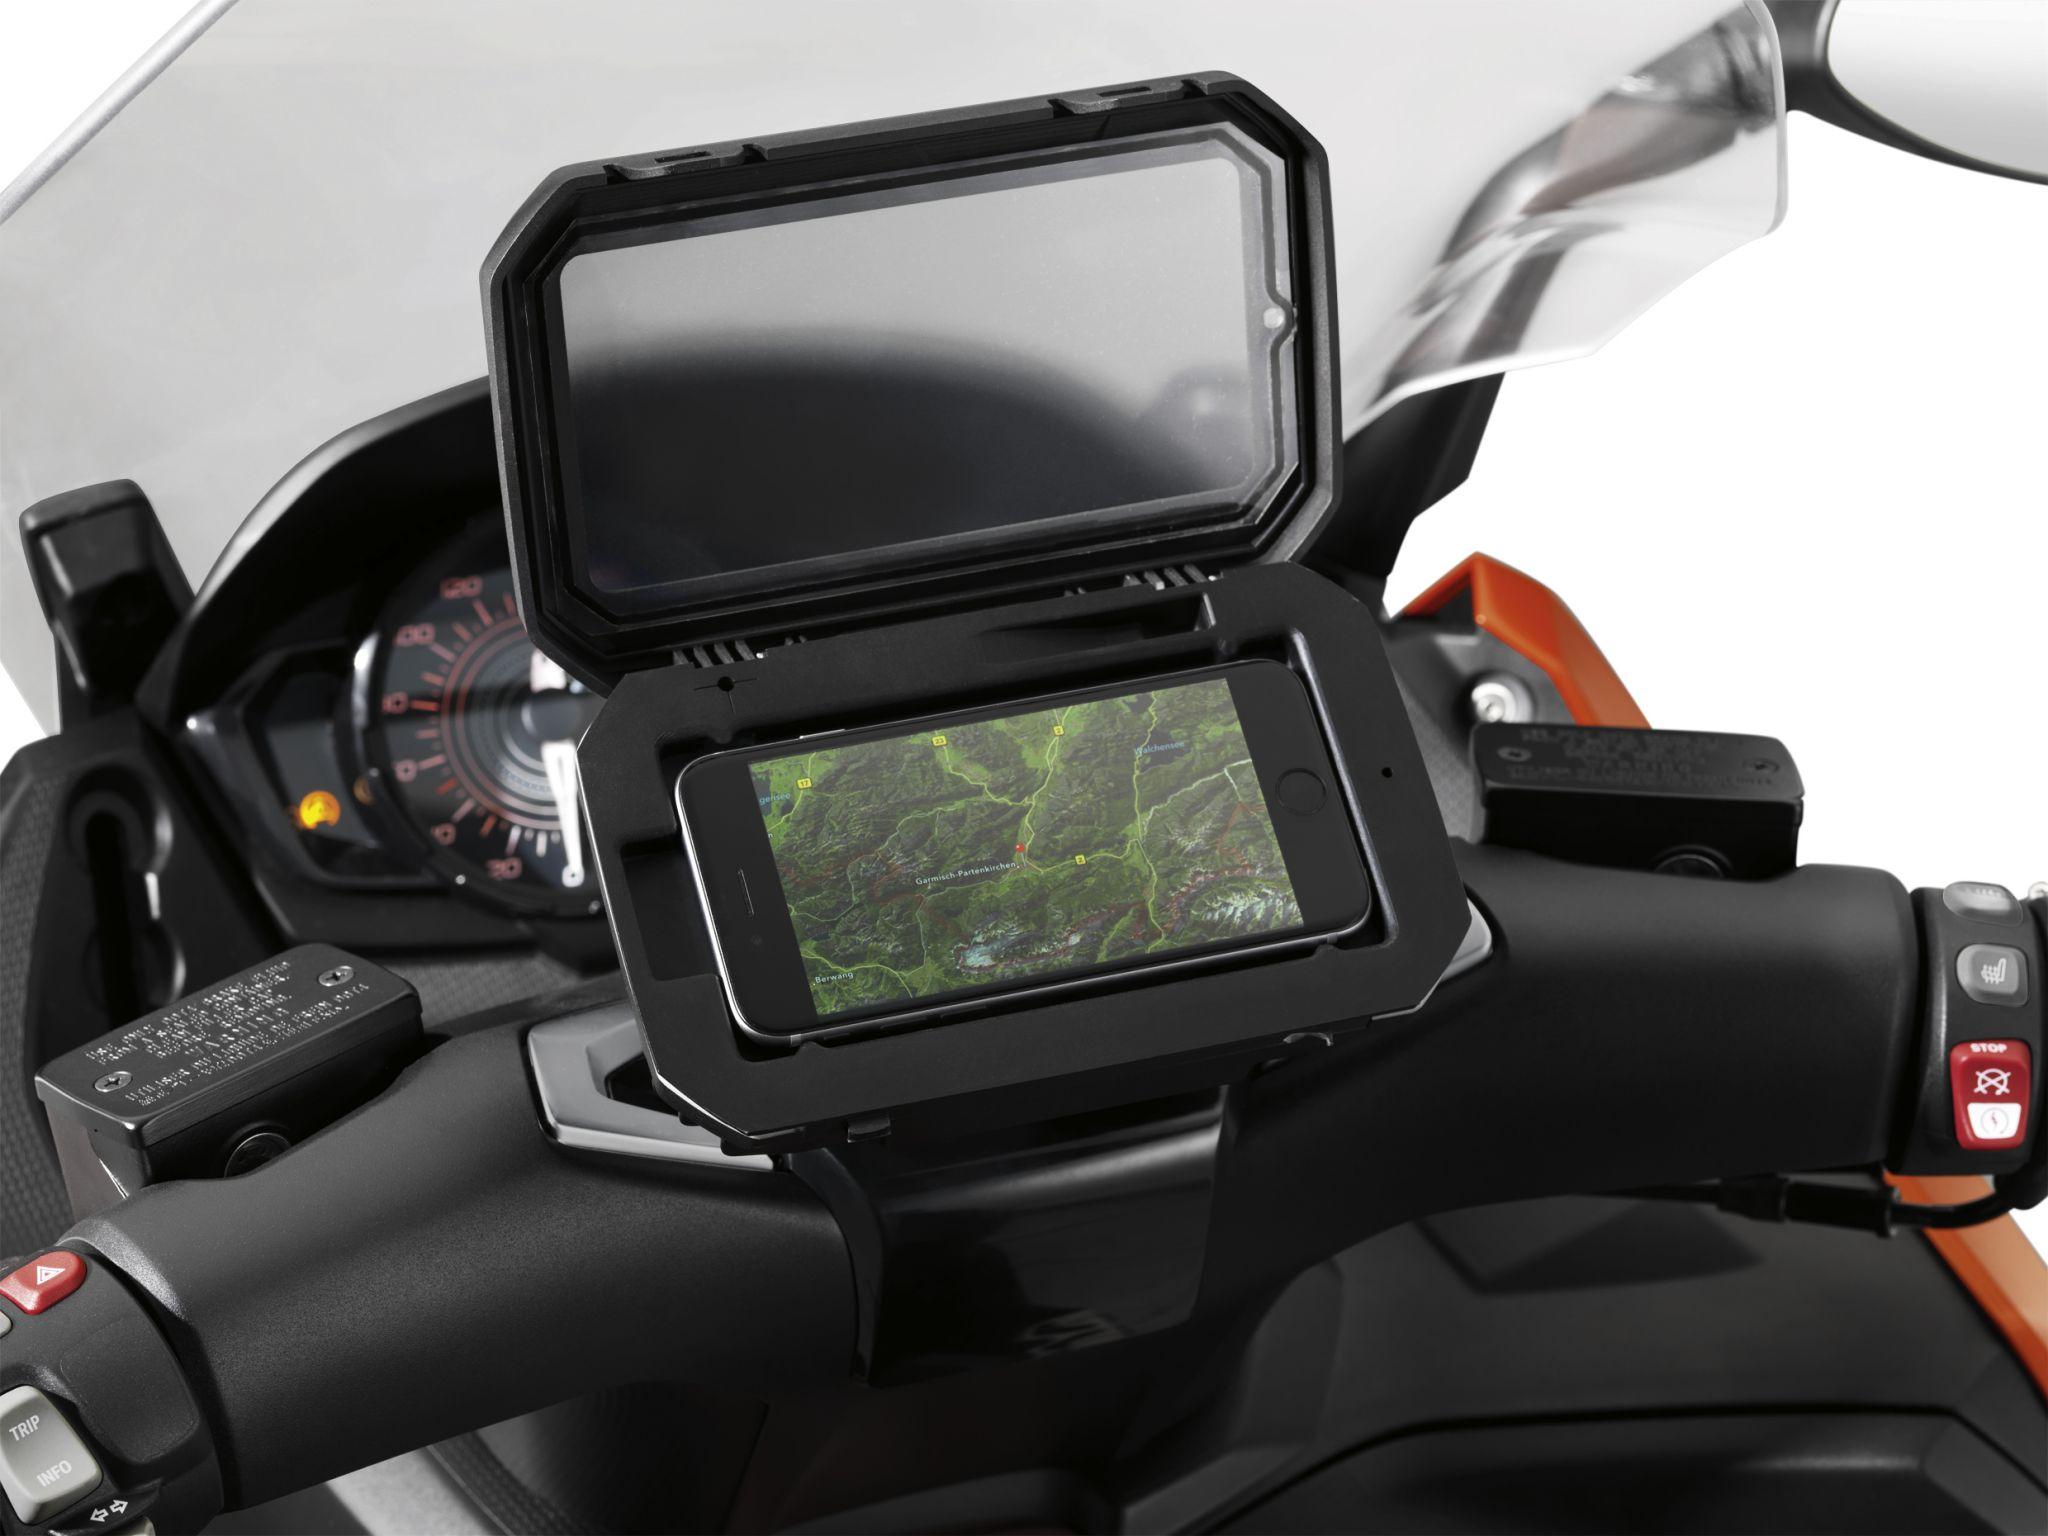 Nieuwe BMW Motorrad Navigator VI en BMW Motorrad Smartphone Cradle